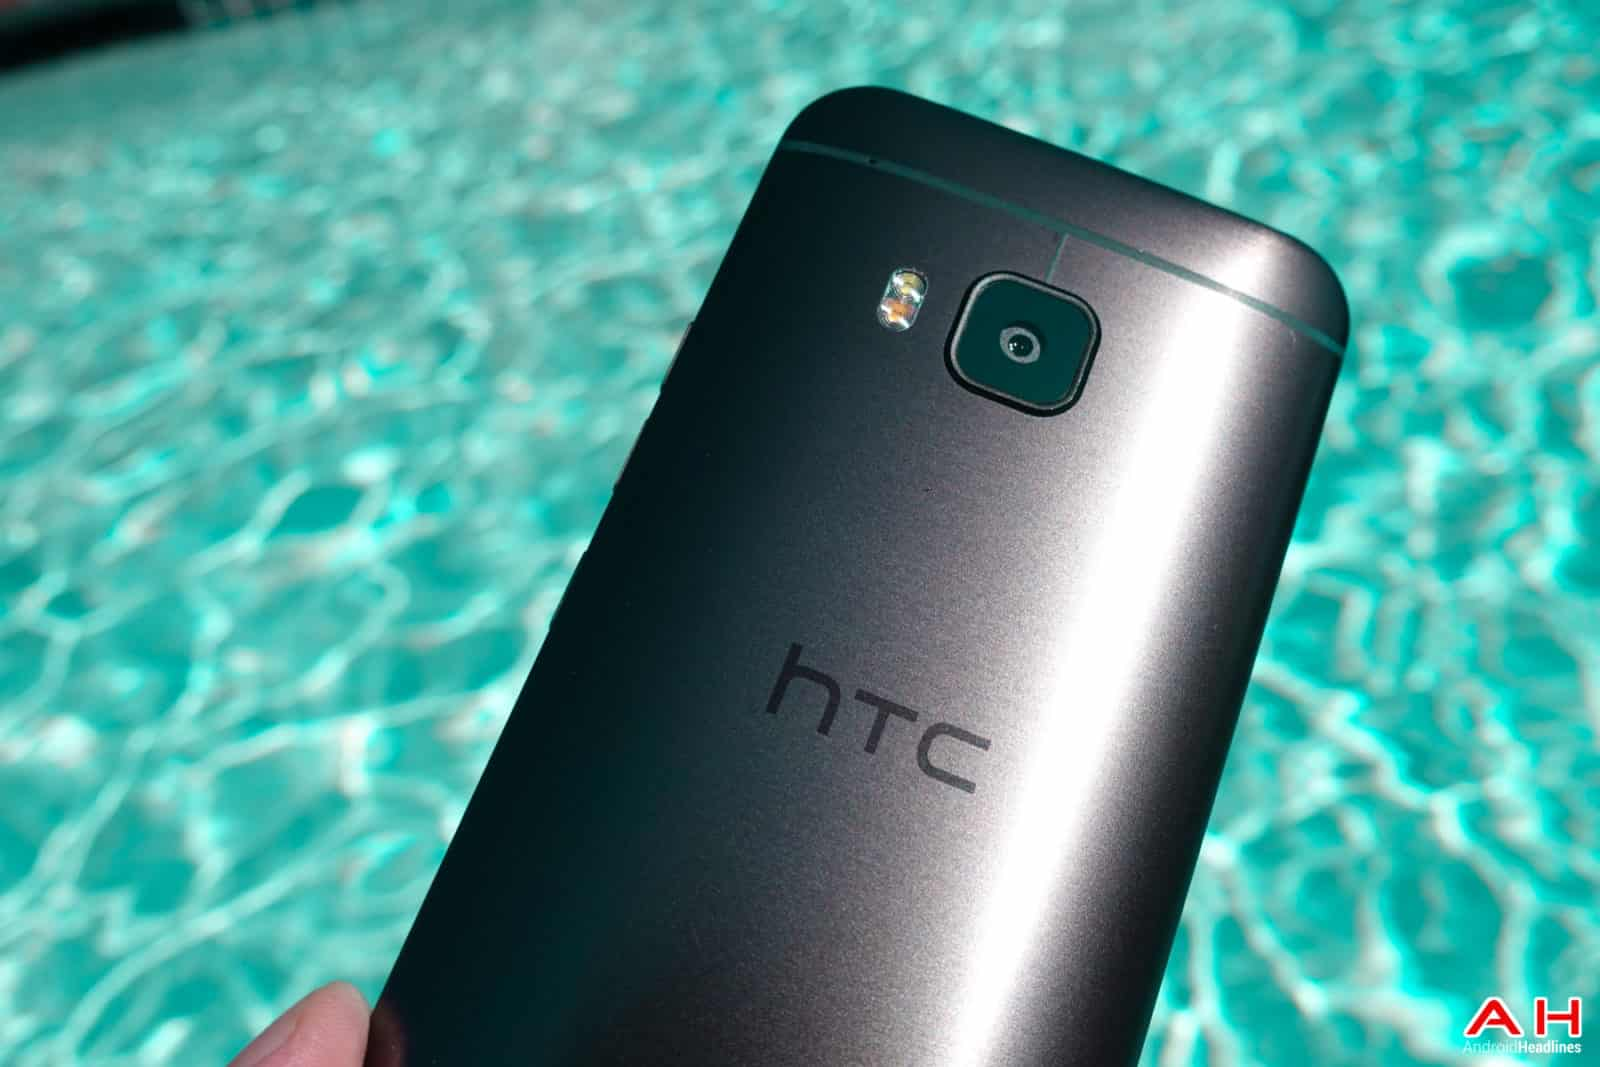 AH HTC One M9 2015 Chris --52